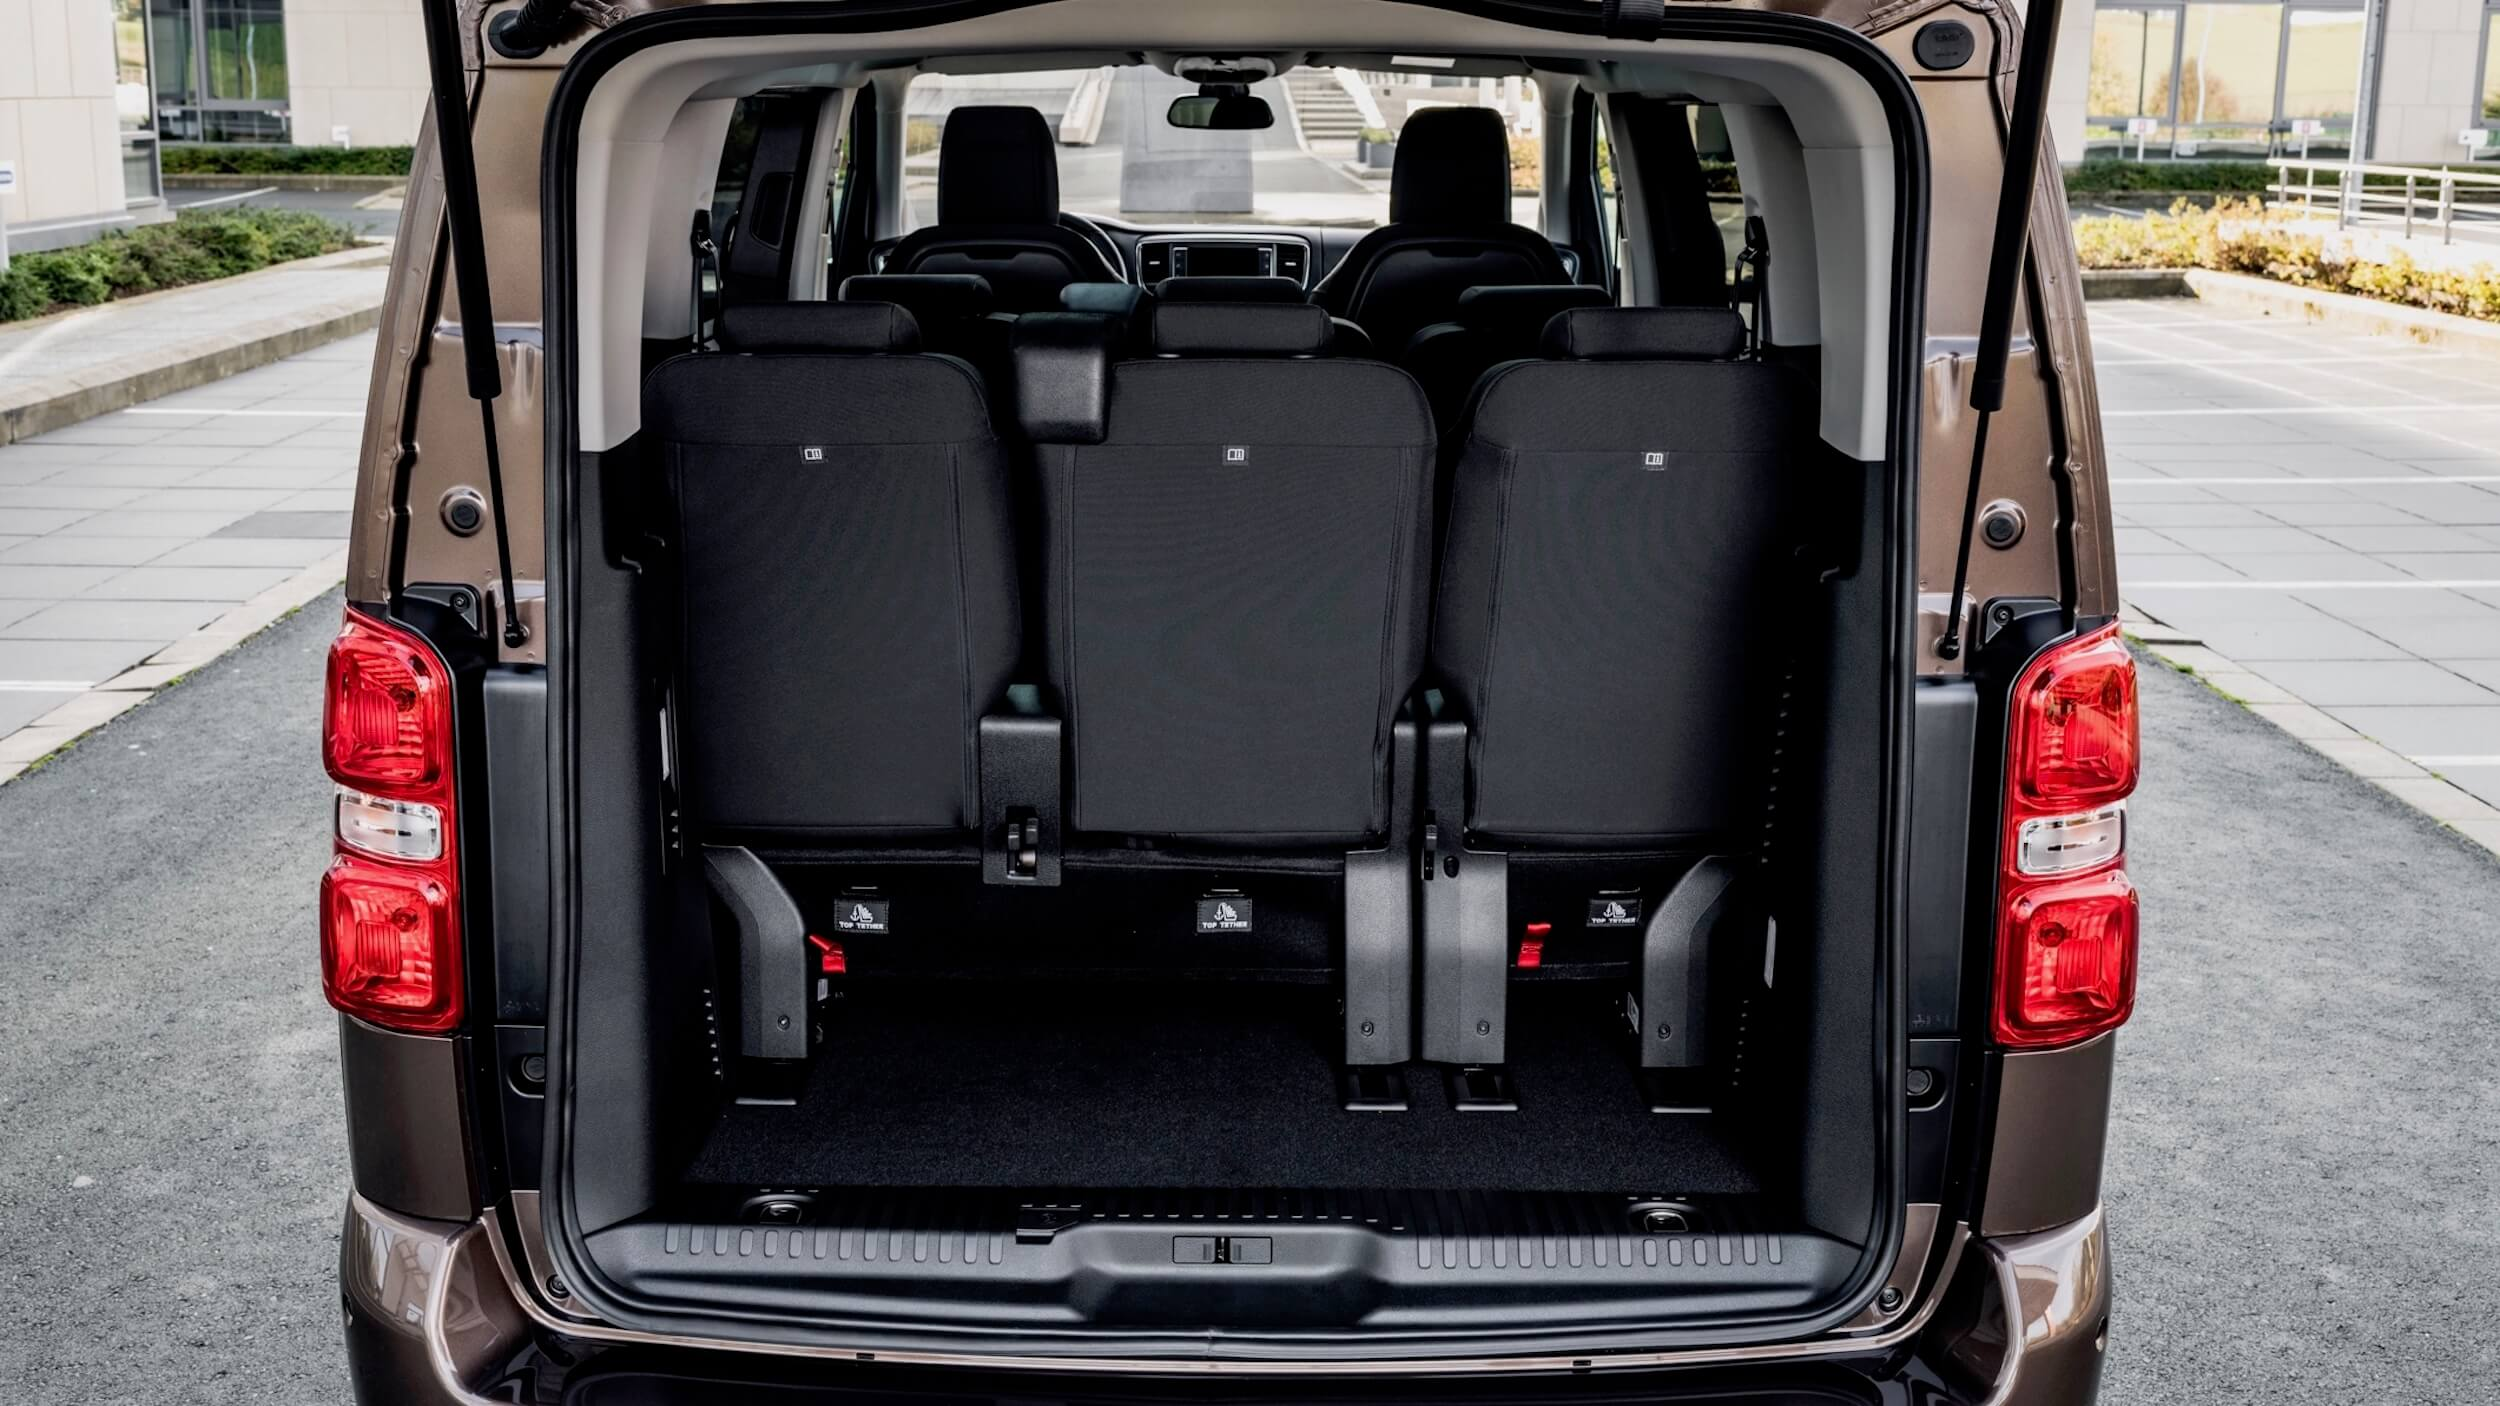 Toyota Proace Verso Electric kofferruimte